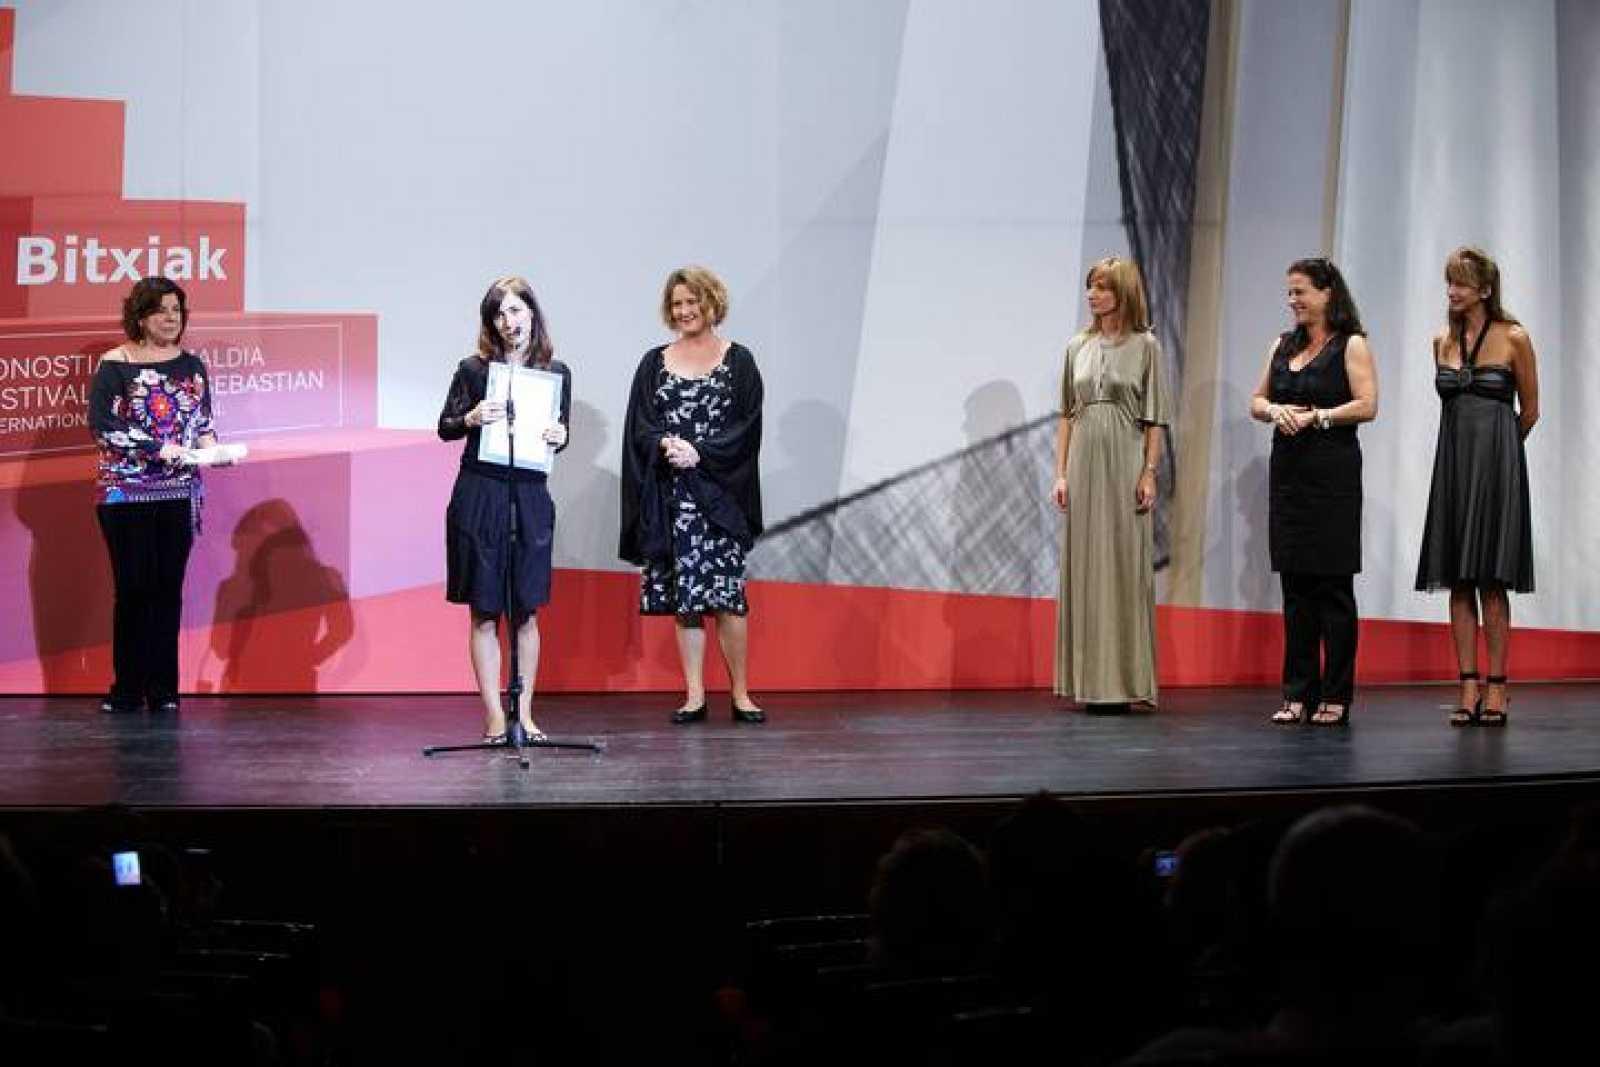 I a D: Lara López, Victoria Galardi, Verónica Llinás, Eva Cebrián, Aizpea Goenaga y Helena Medina.